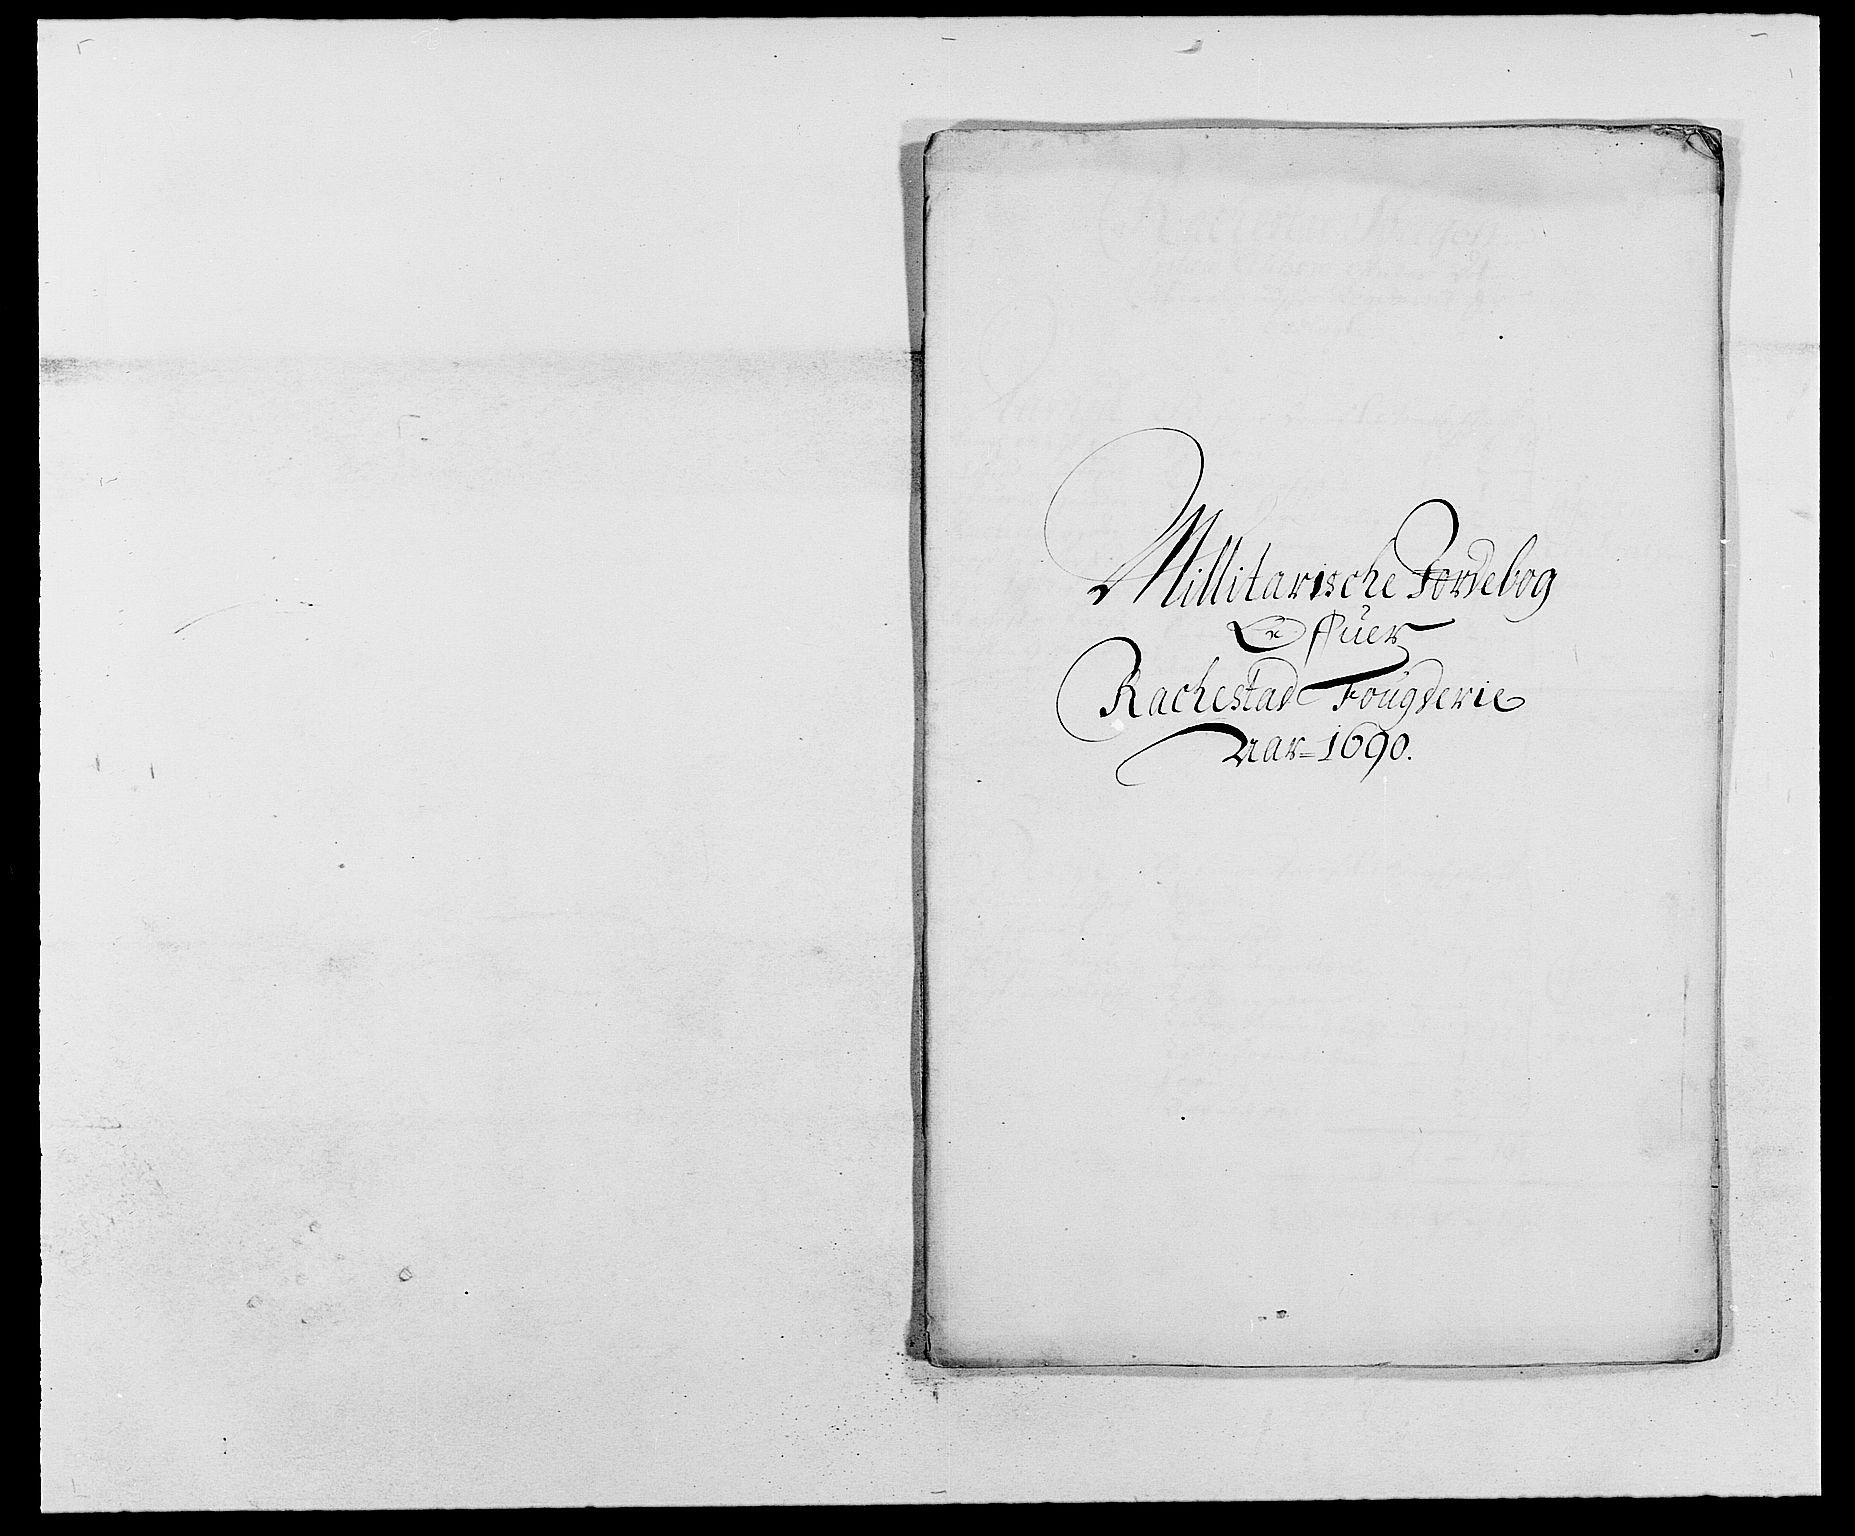 RA, Rentekammeret inntil 1814, Reviderte regnskaper, Fogderegnskap, R05/L0277: Fogderegnskap Rakkestad, 1689-1690, s. 351